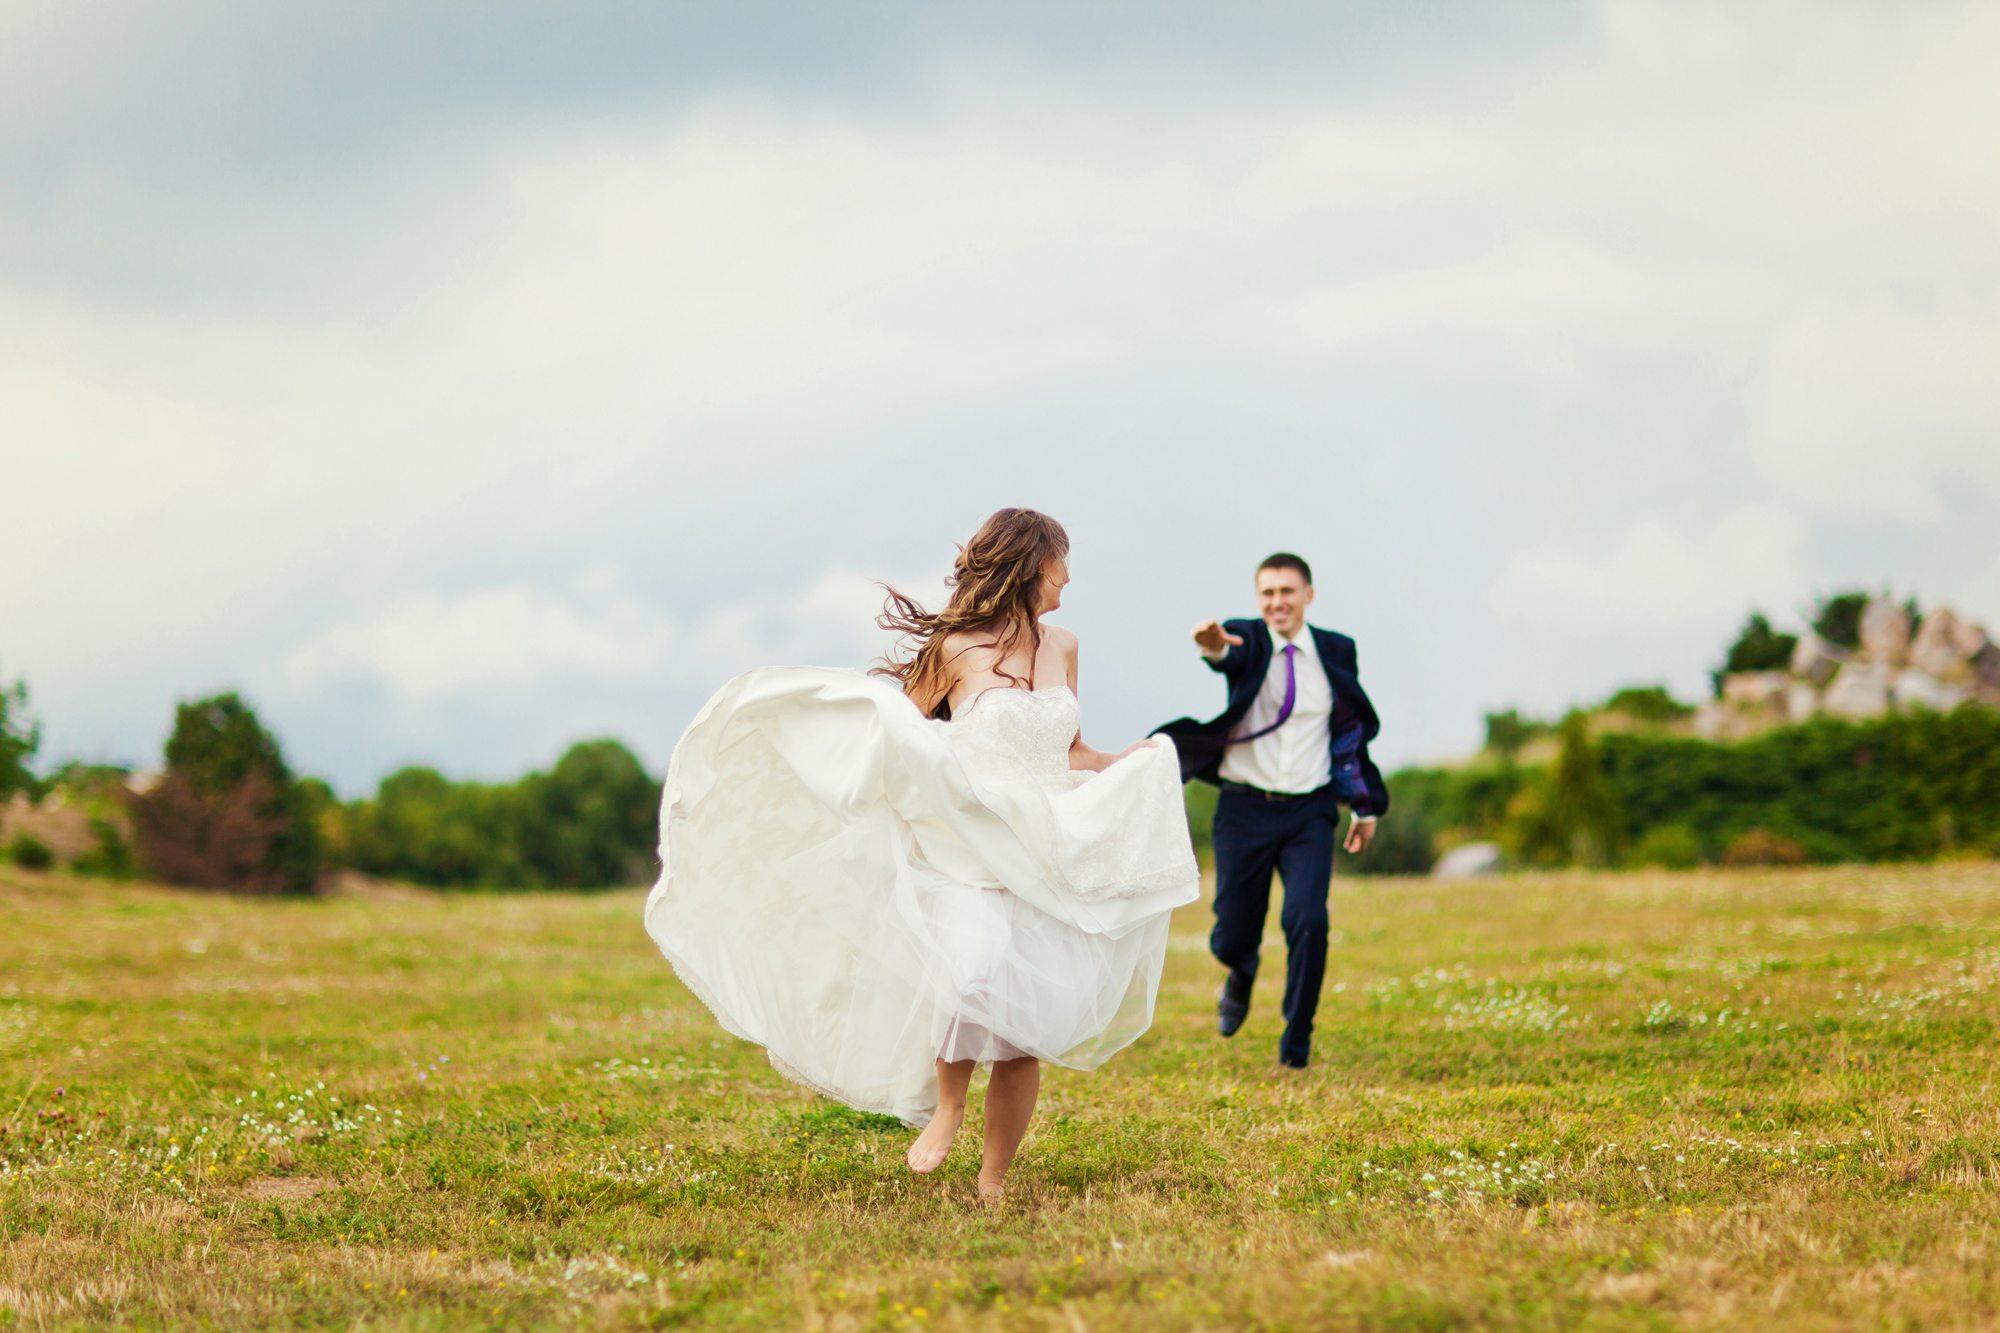 Cold feet on wedding day